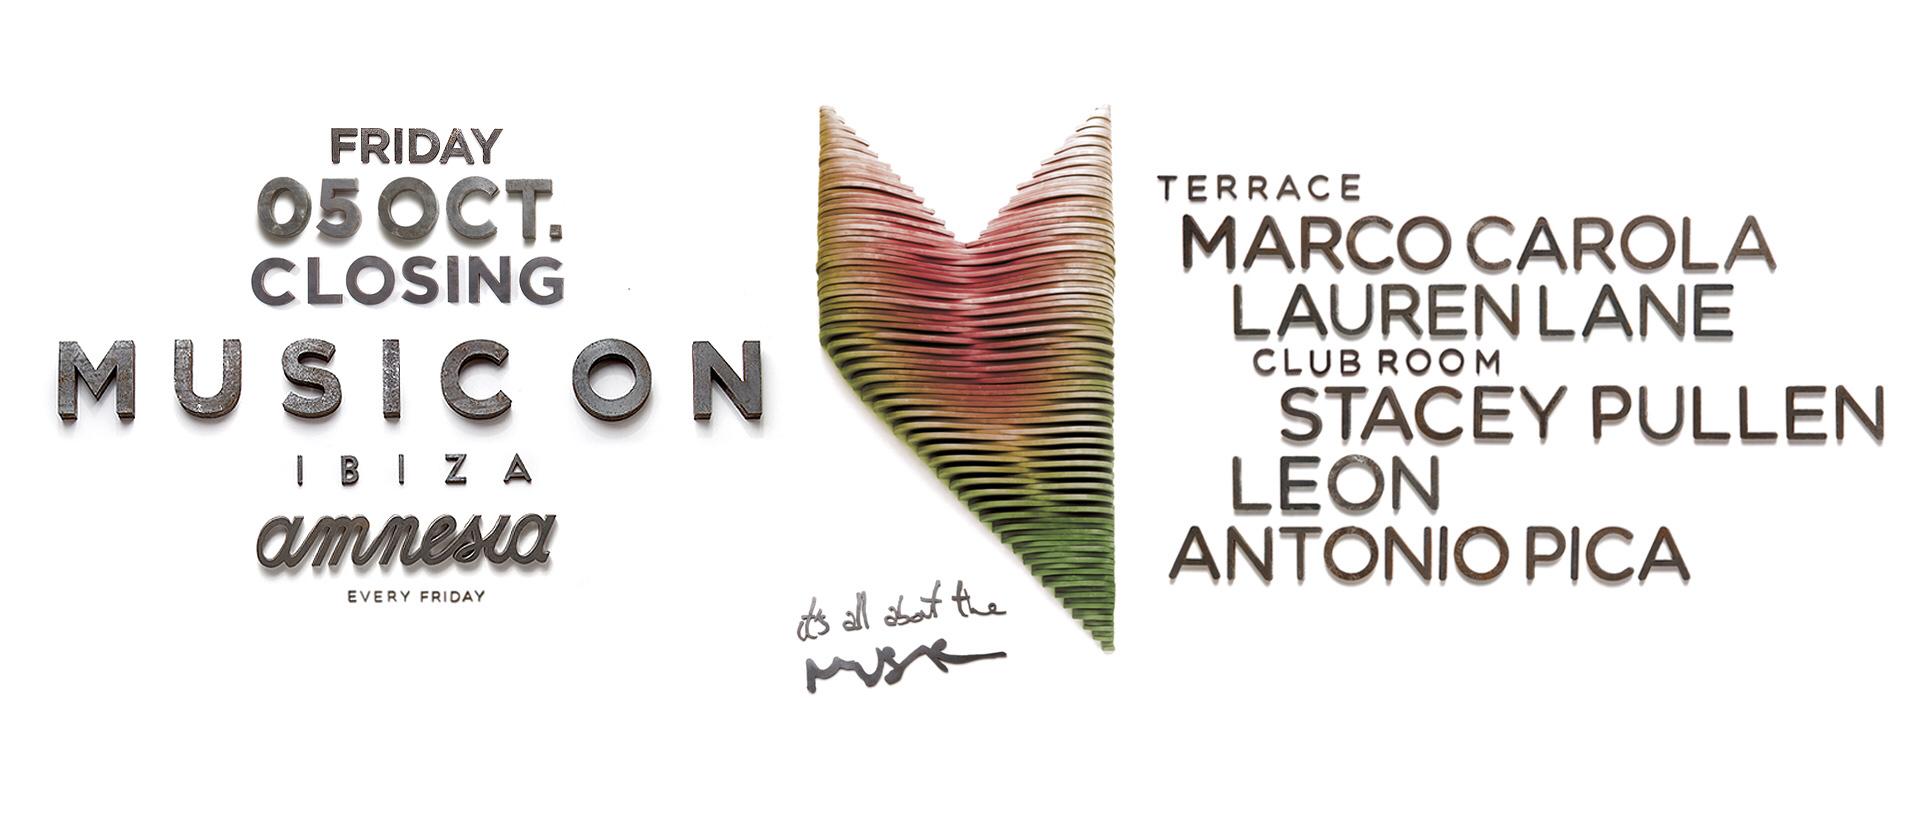 Music On Ibiza: 3-DAYS CLOSING & 3 Locations!